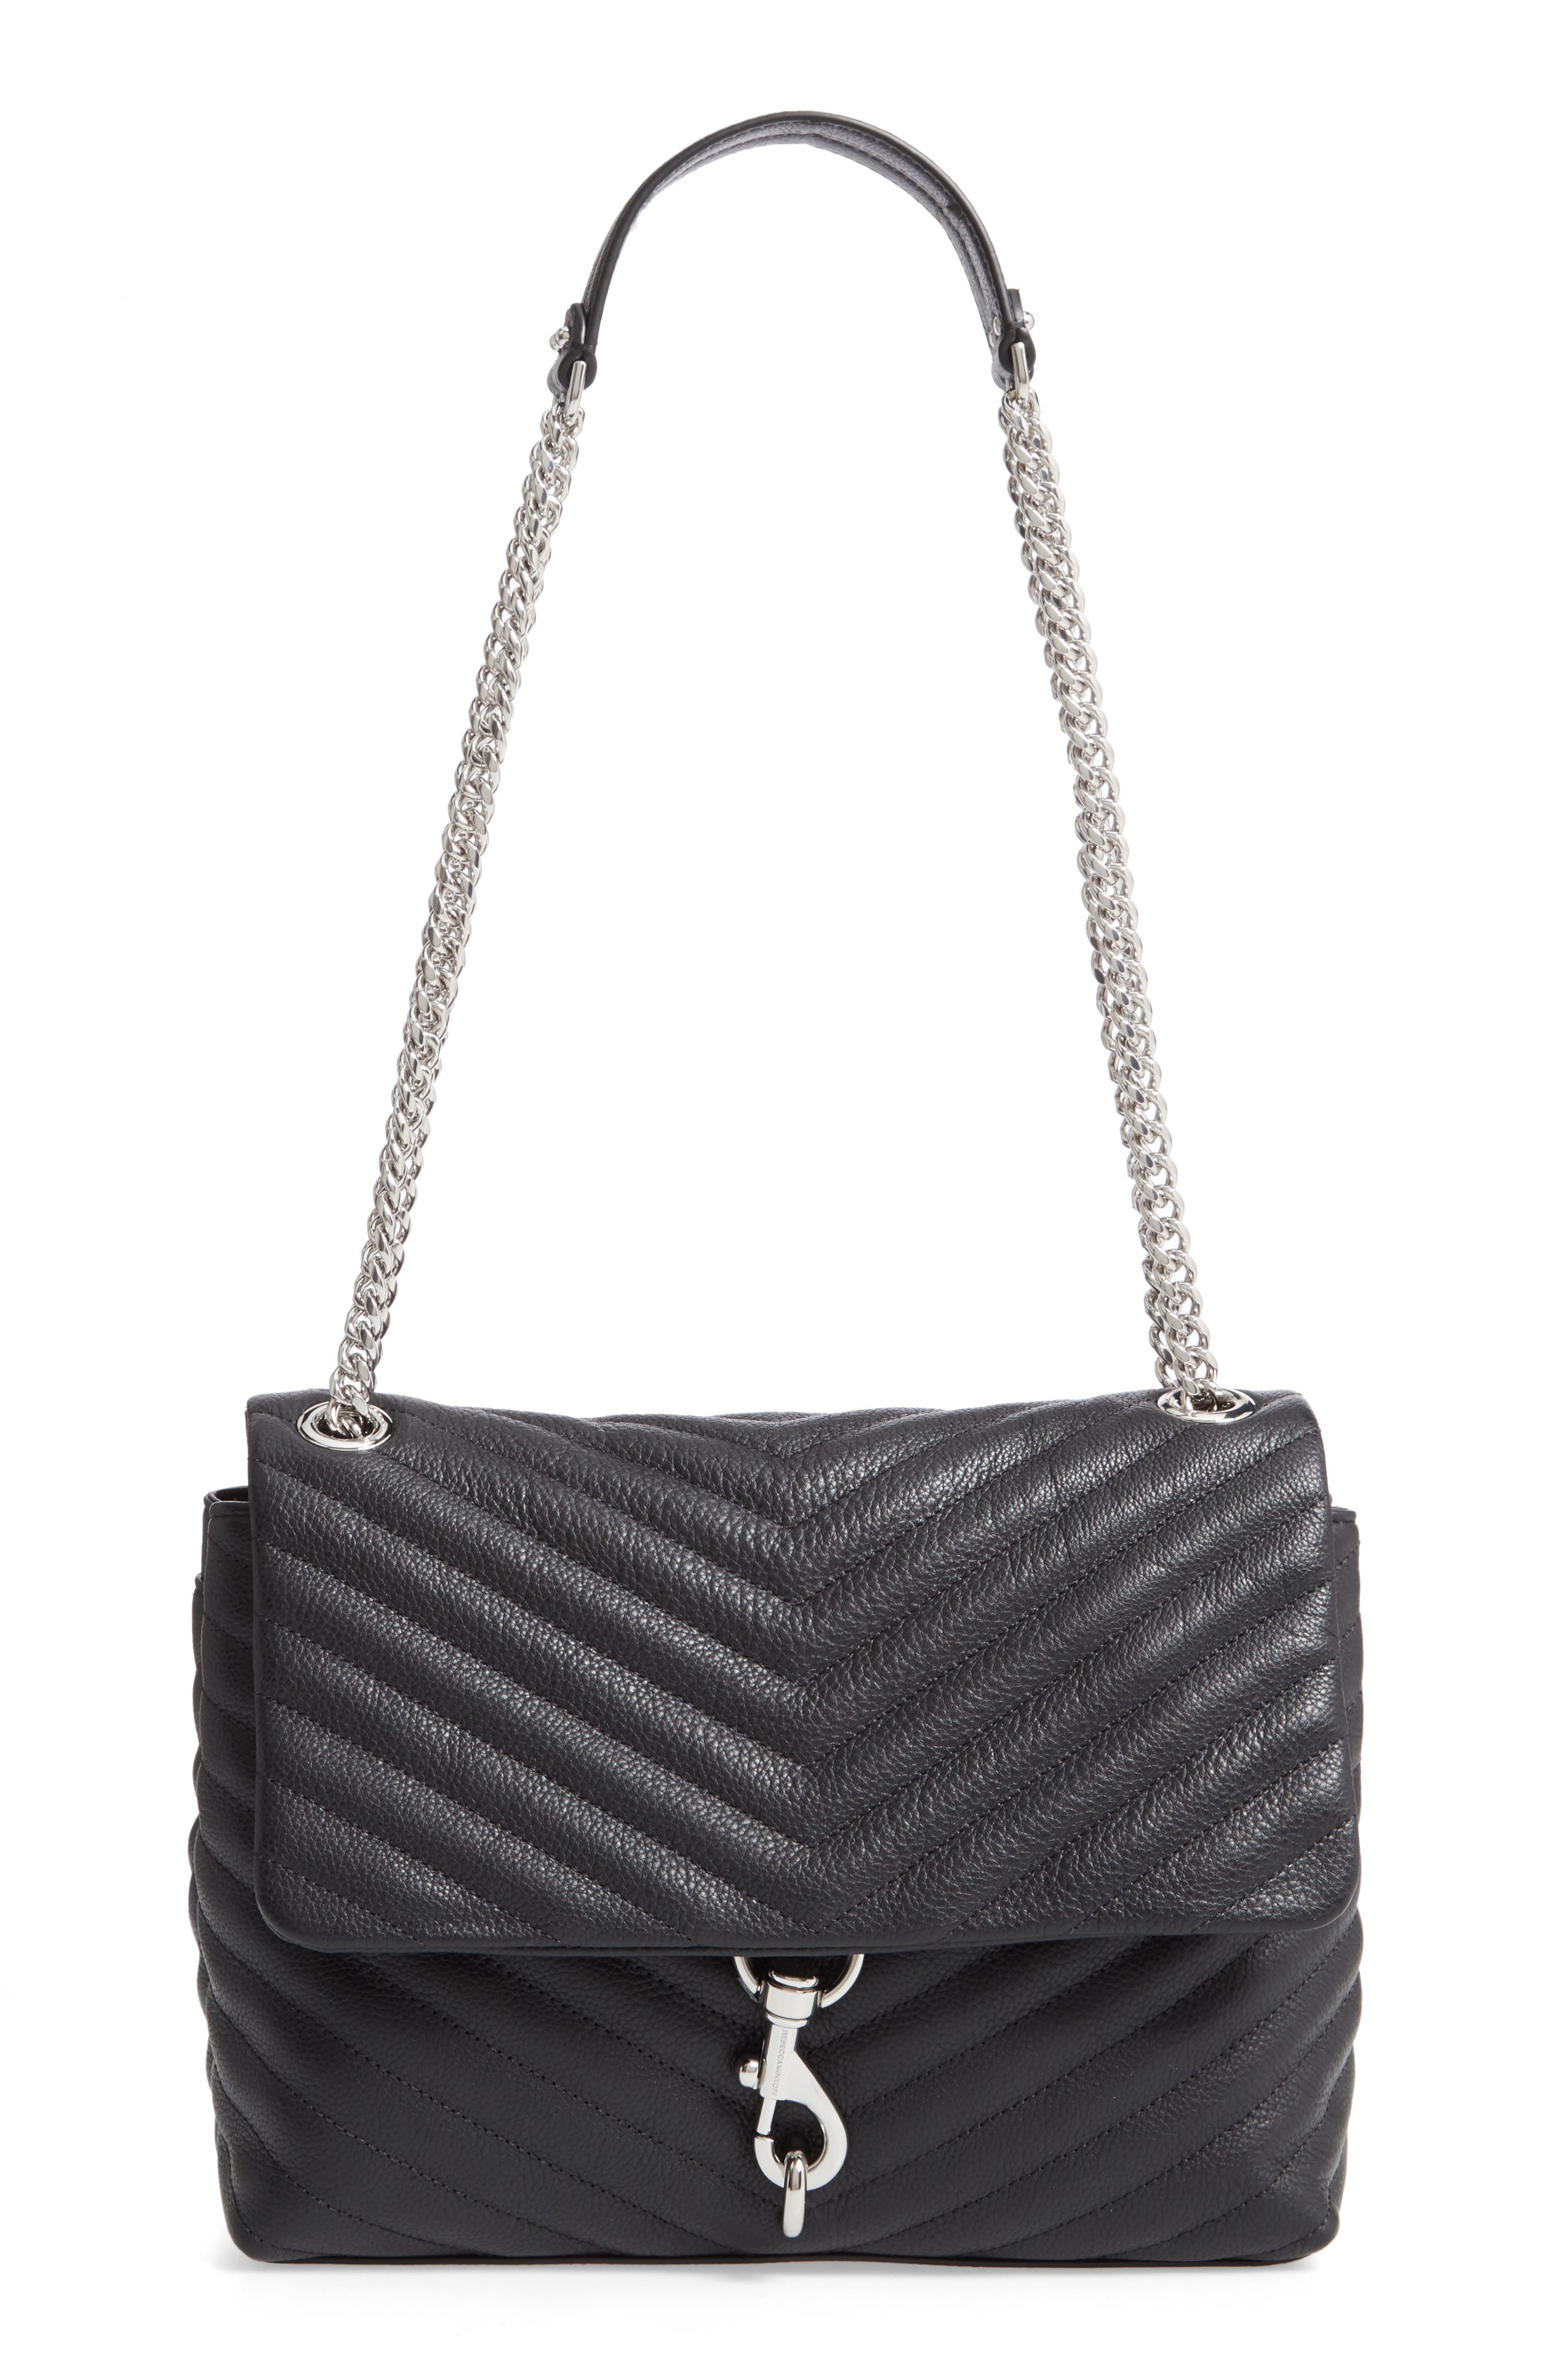 REBECCA MINKOFF Edie Flap Quilted Leather Shoulder Bag, Main, color, BLACK